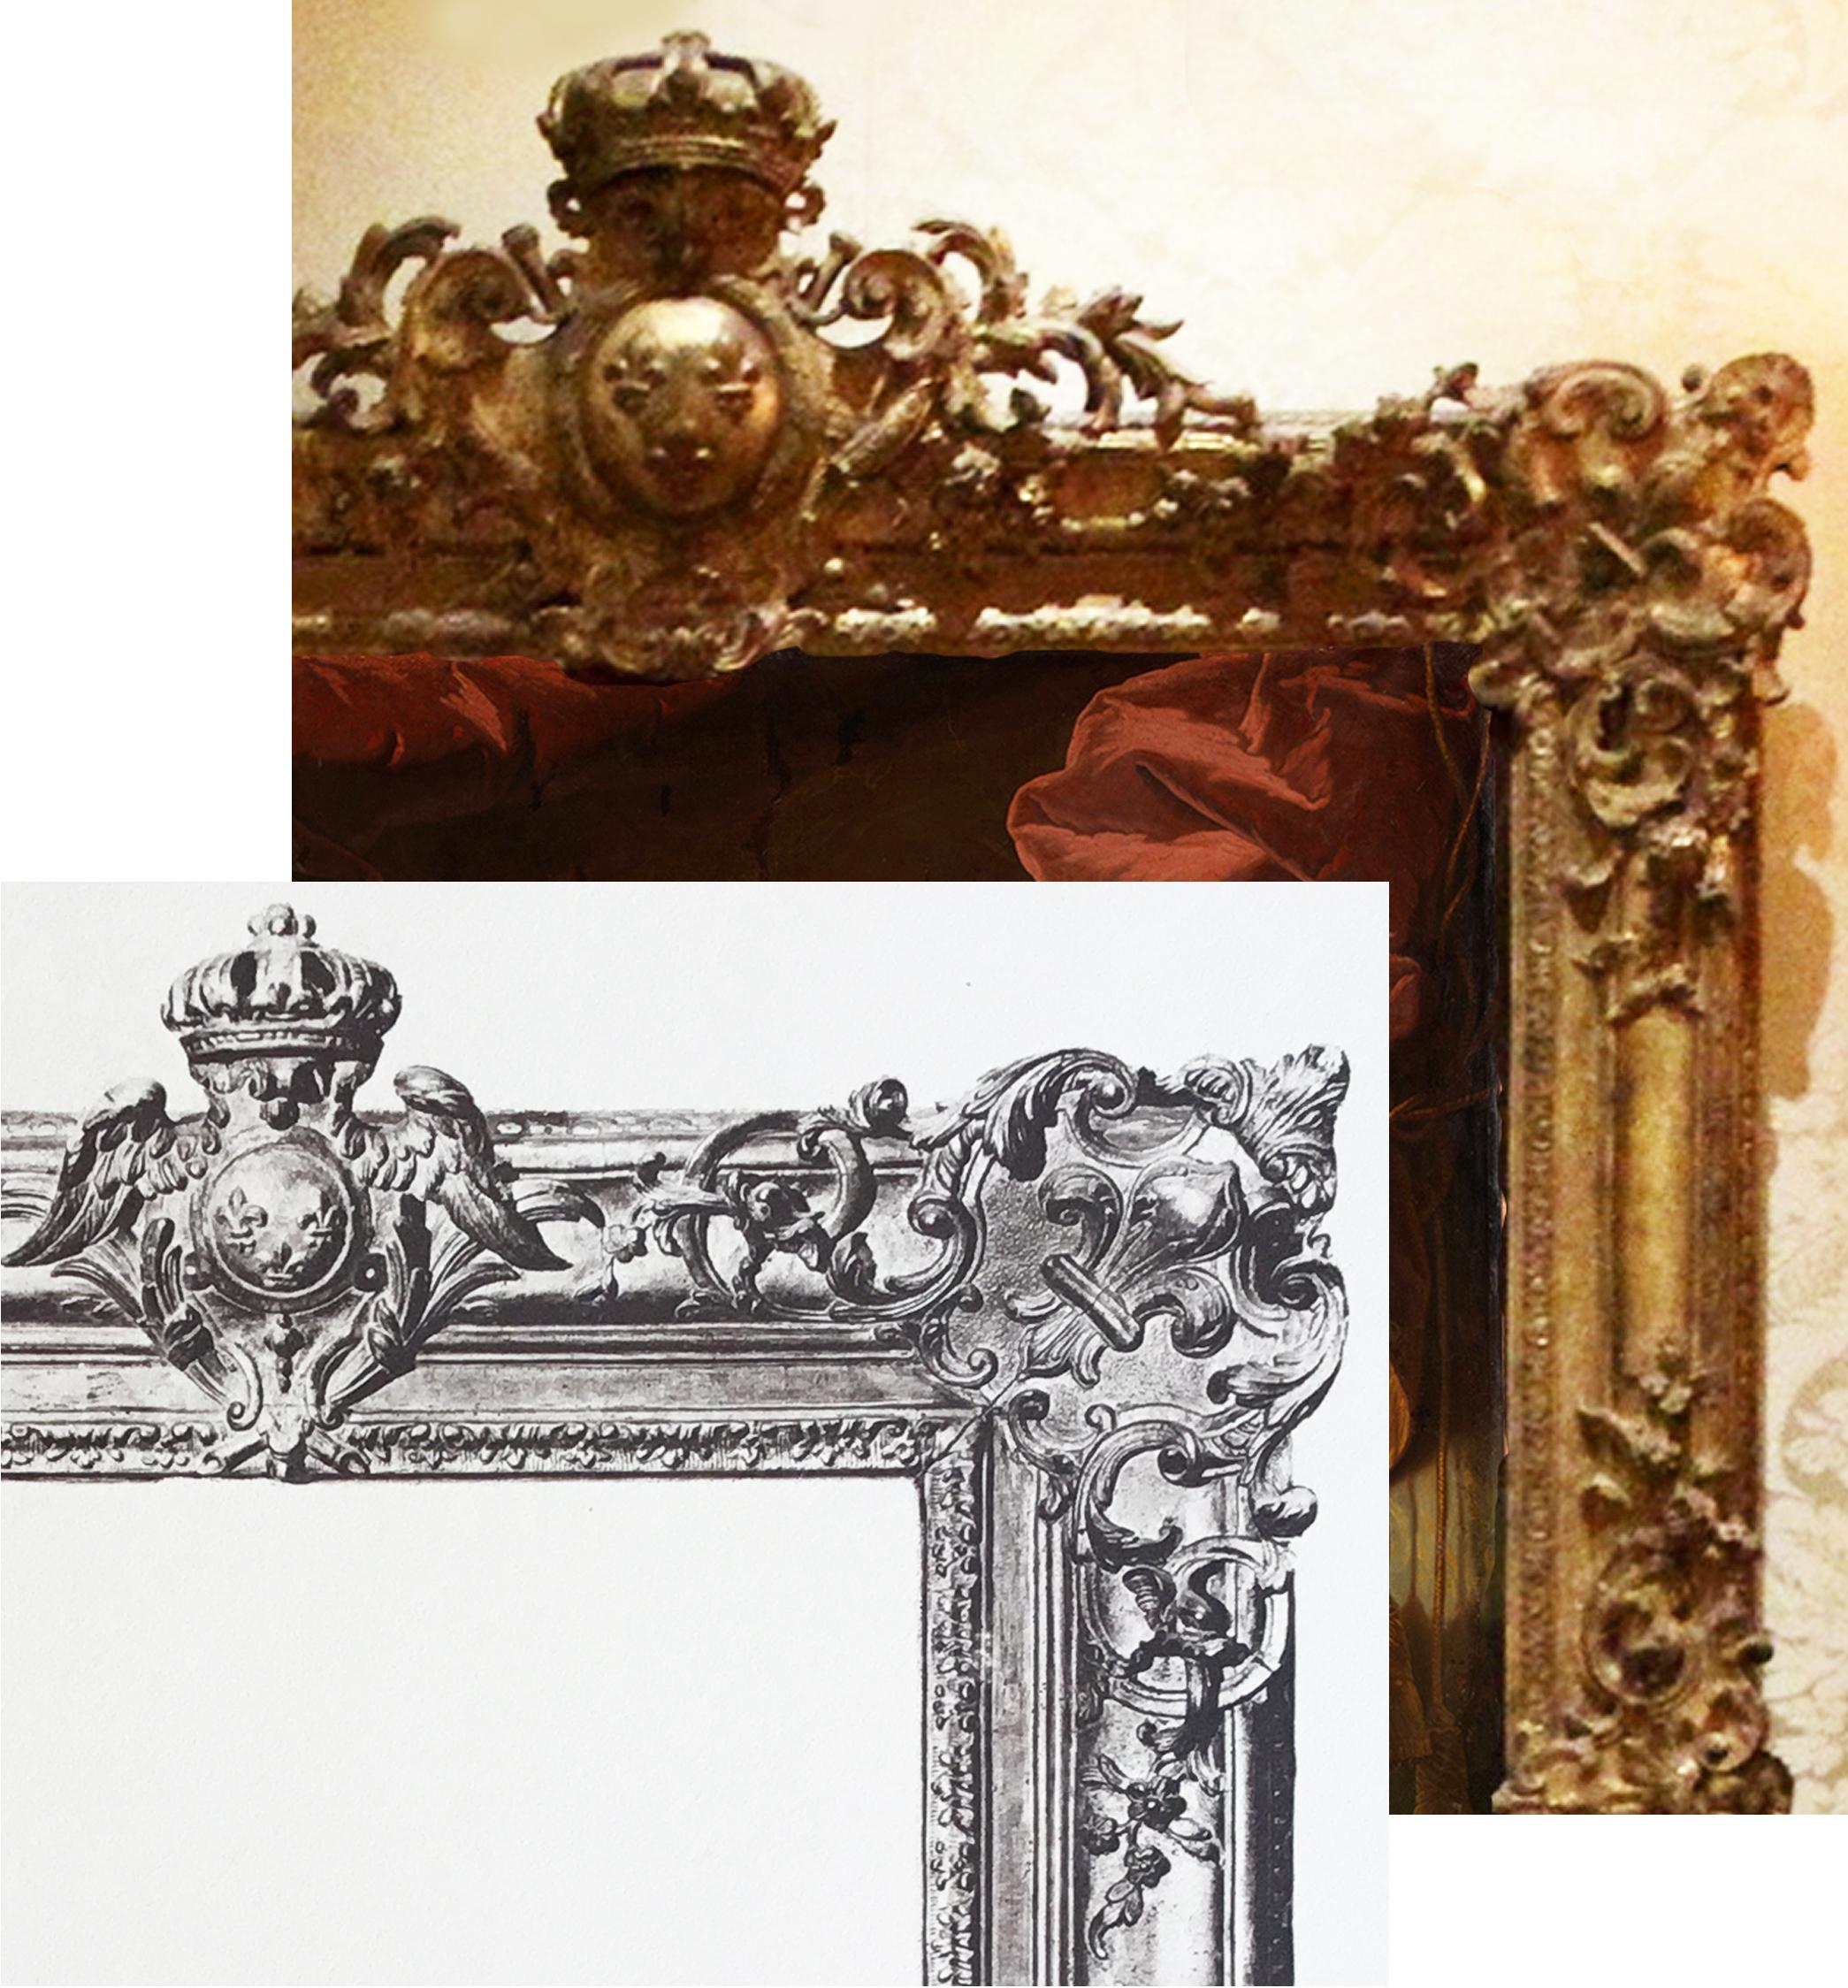 6B Plate 35 detail & detail of Rigaud Louis XV